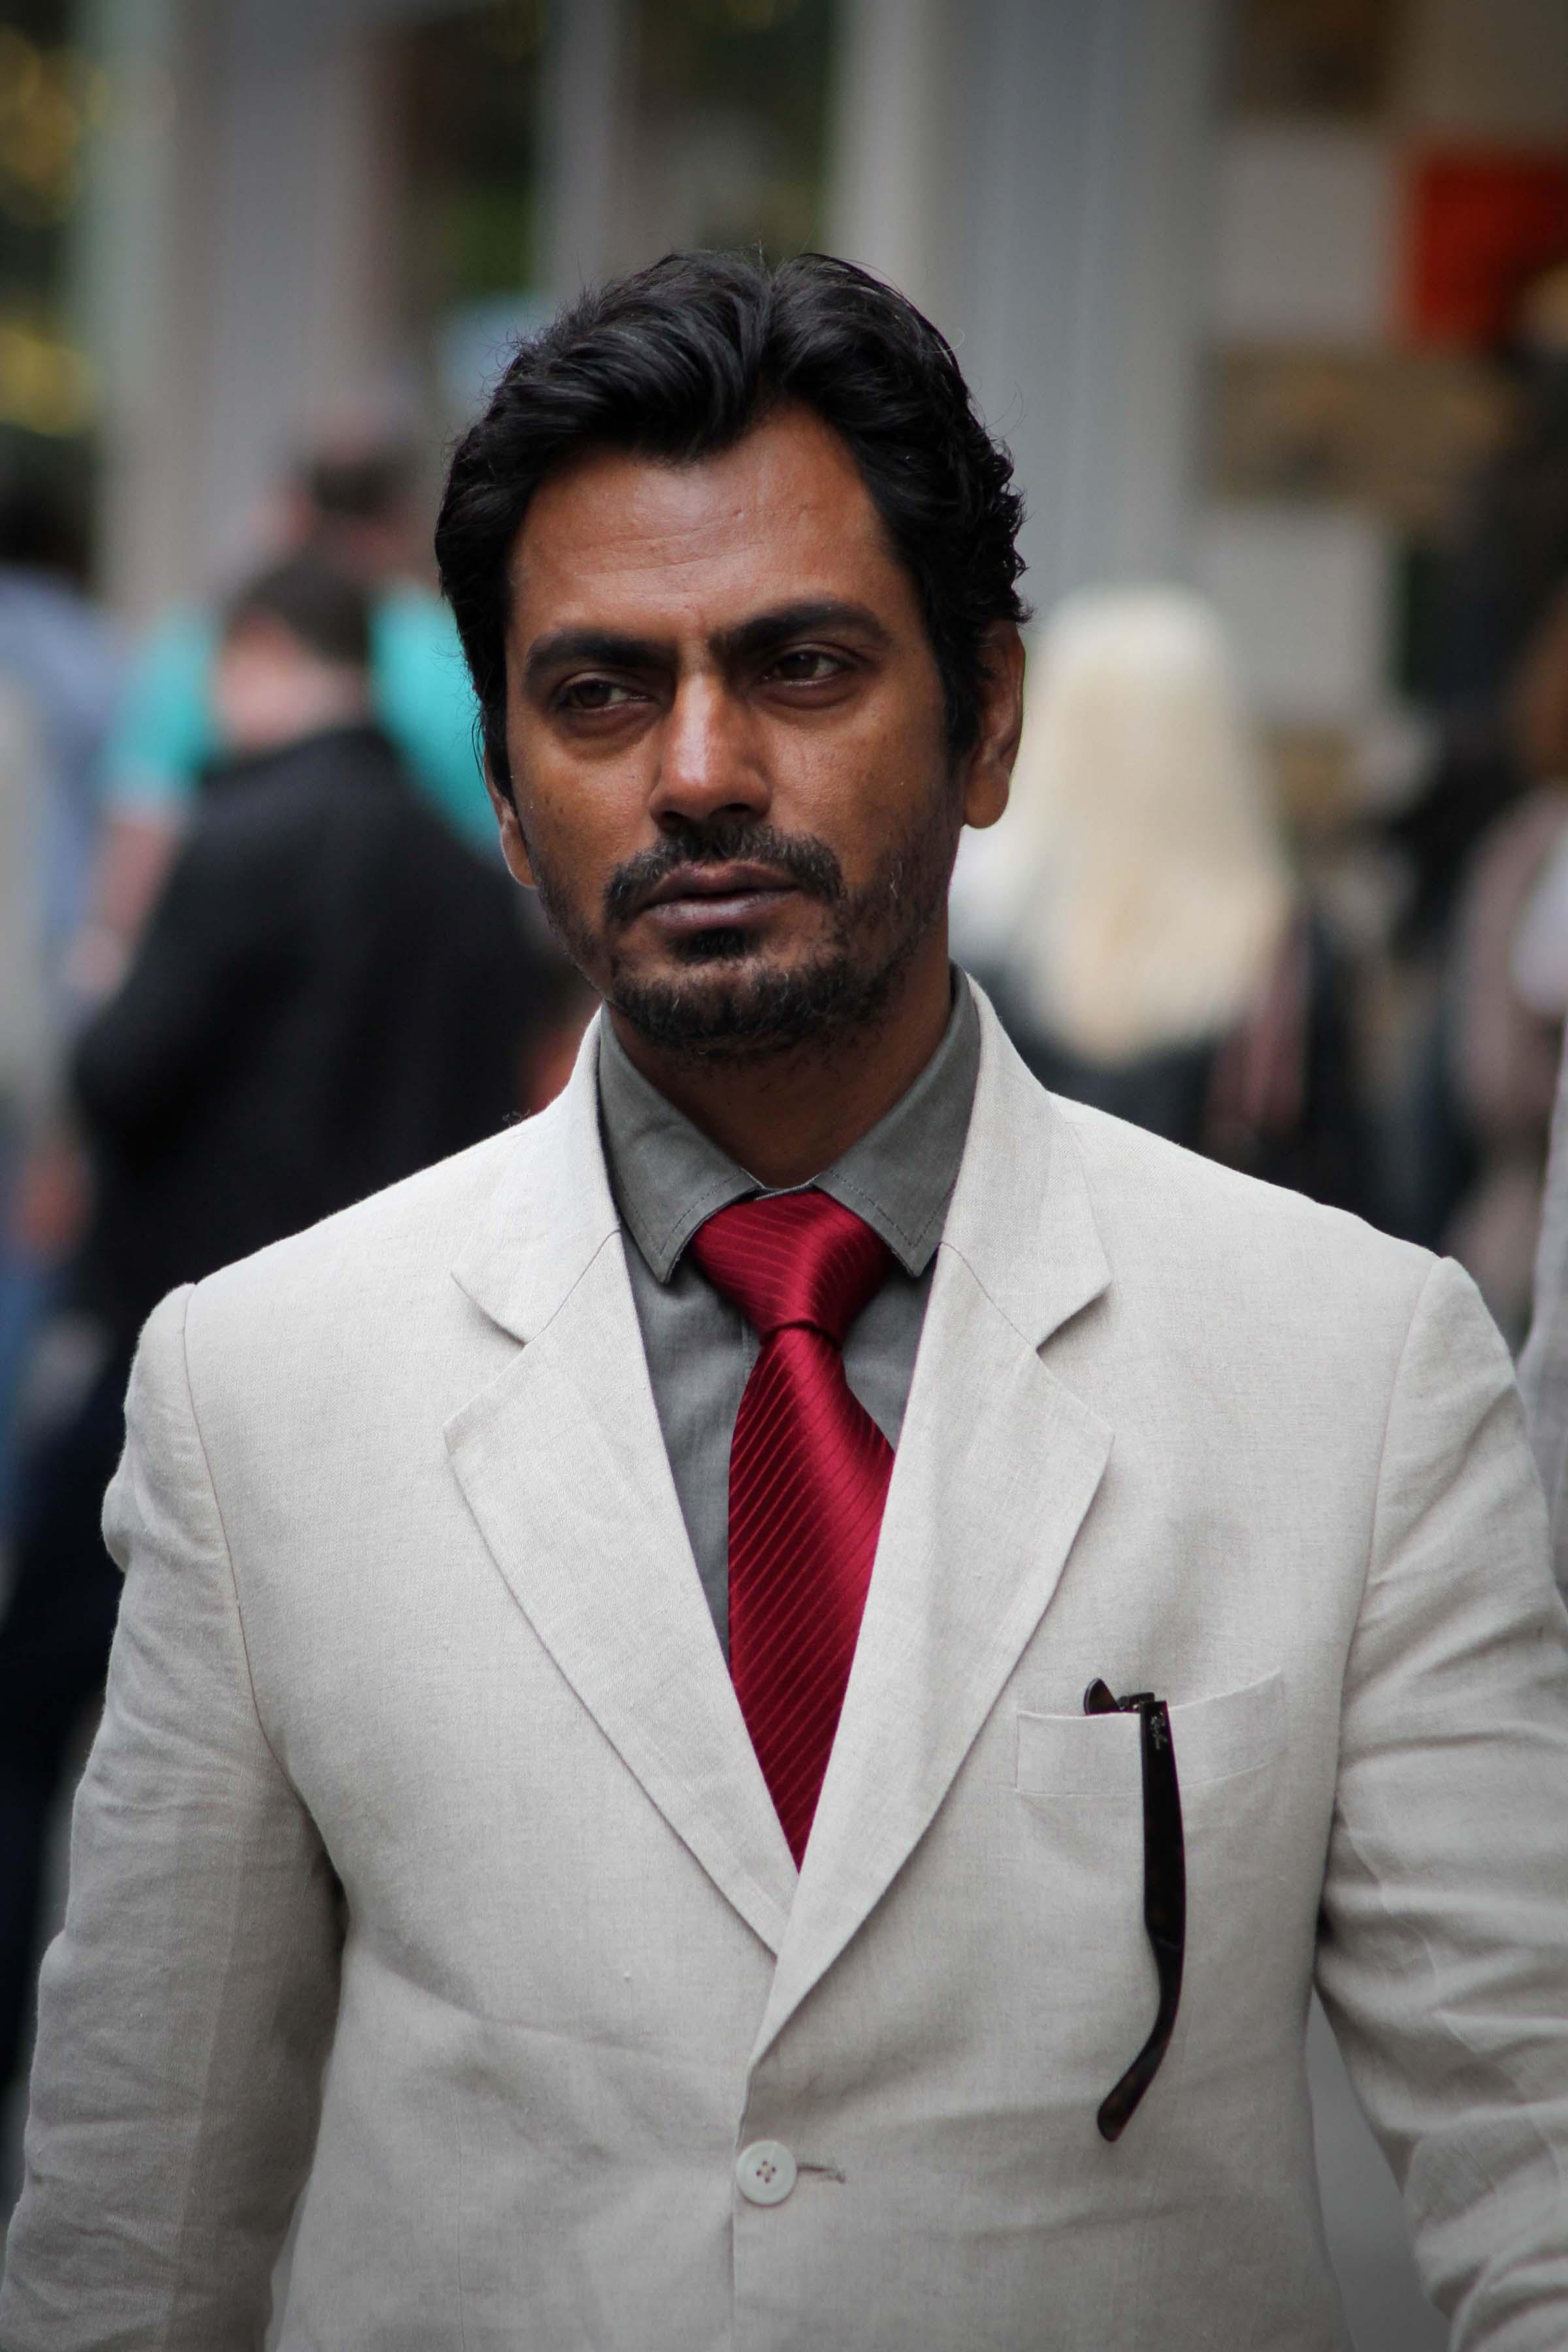 nawazuddin siddiqui twitter